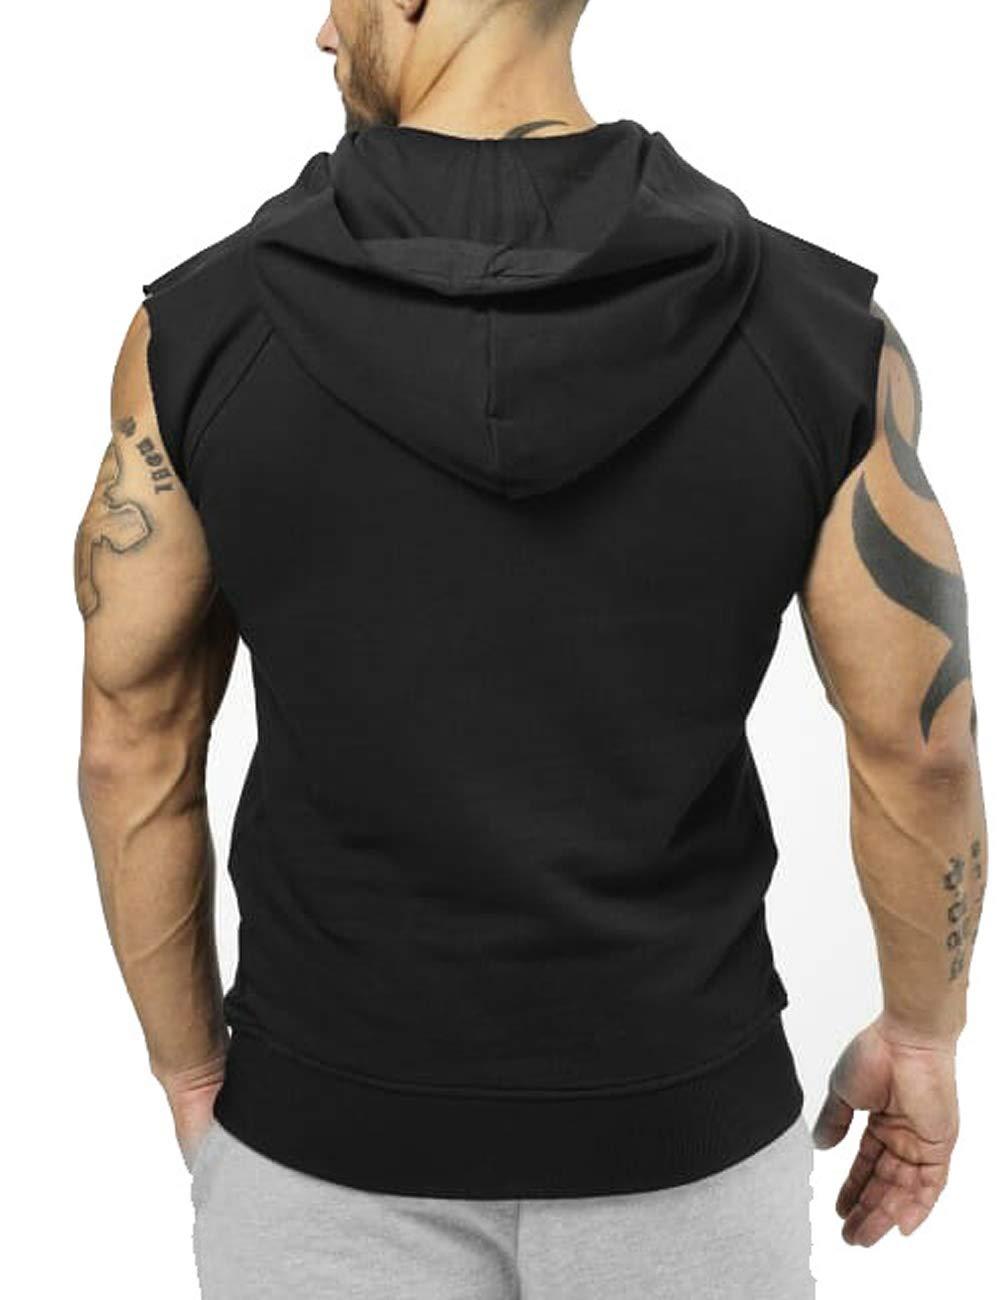 291dd0f17969e2 PAIZH Men s Bodybuilding Sleveless Hoodies Gym Workout Hooded Tank ...